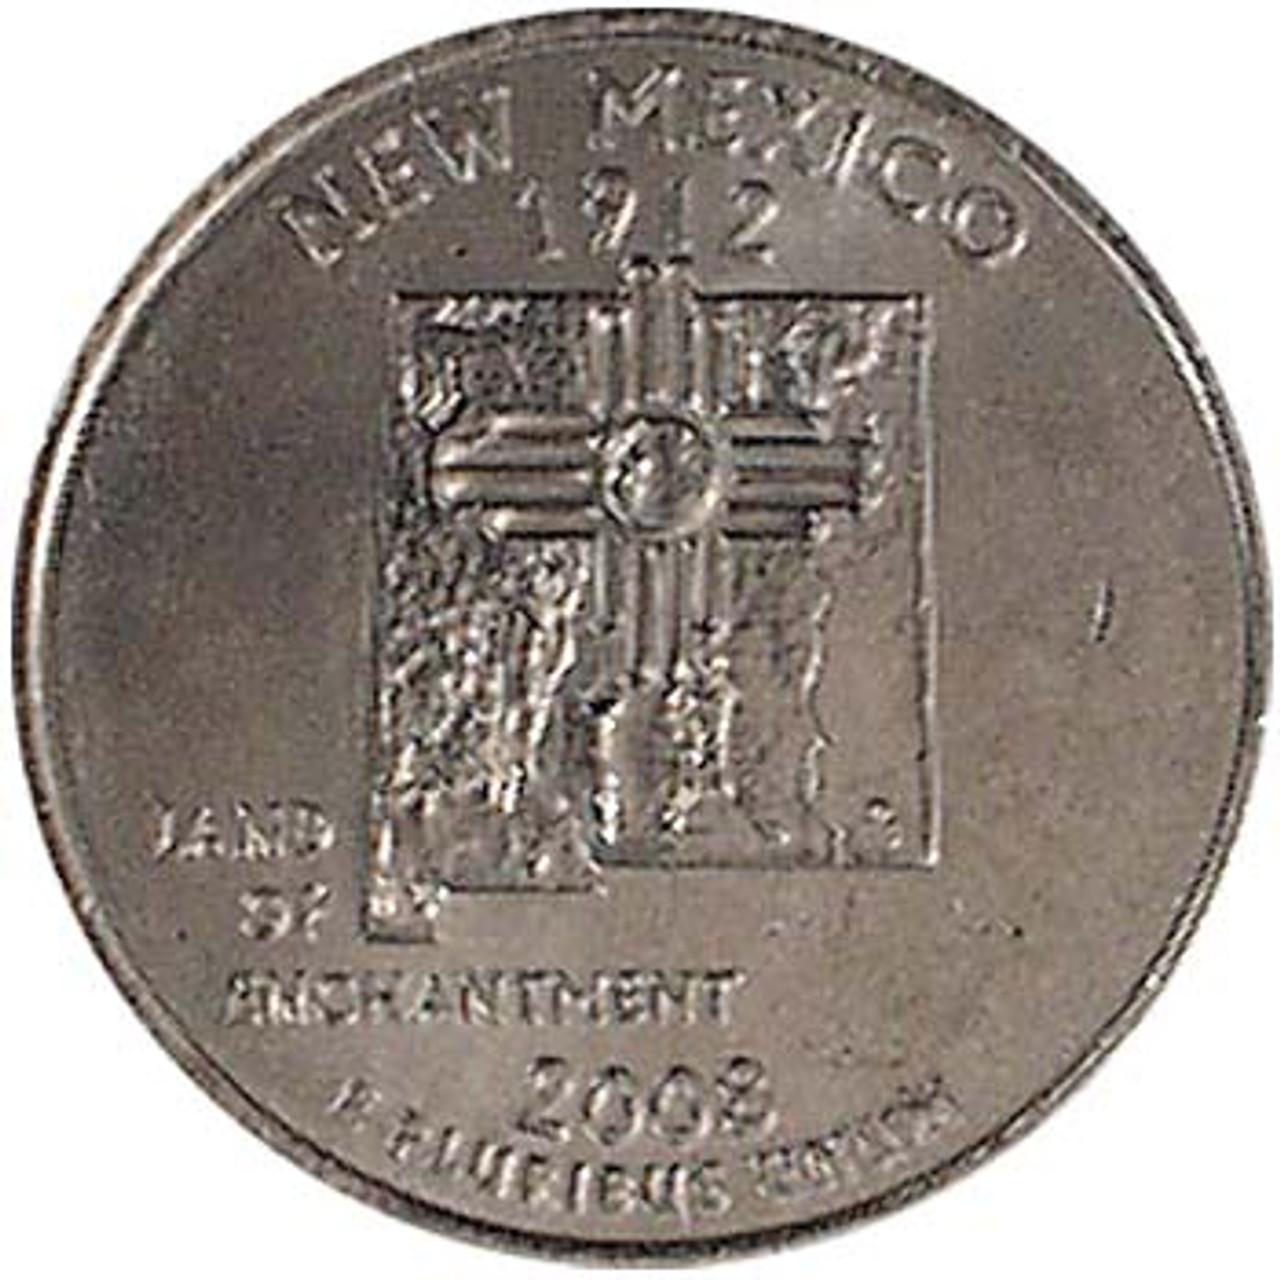 2008-P New Mexico Quarter Brilliant Uncirculated Image 1